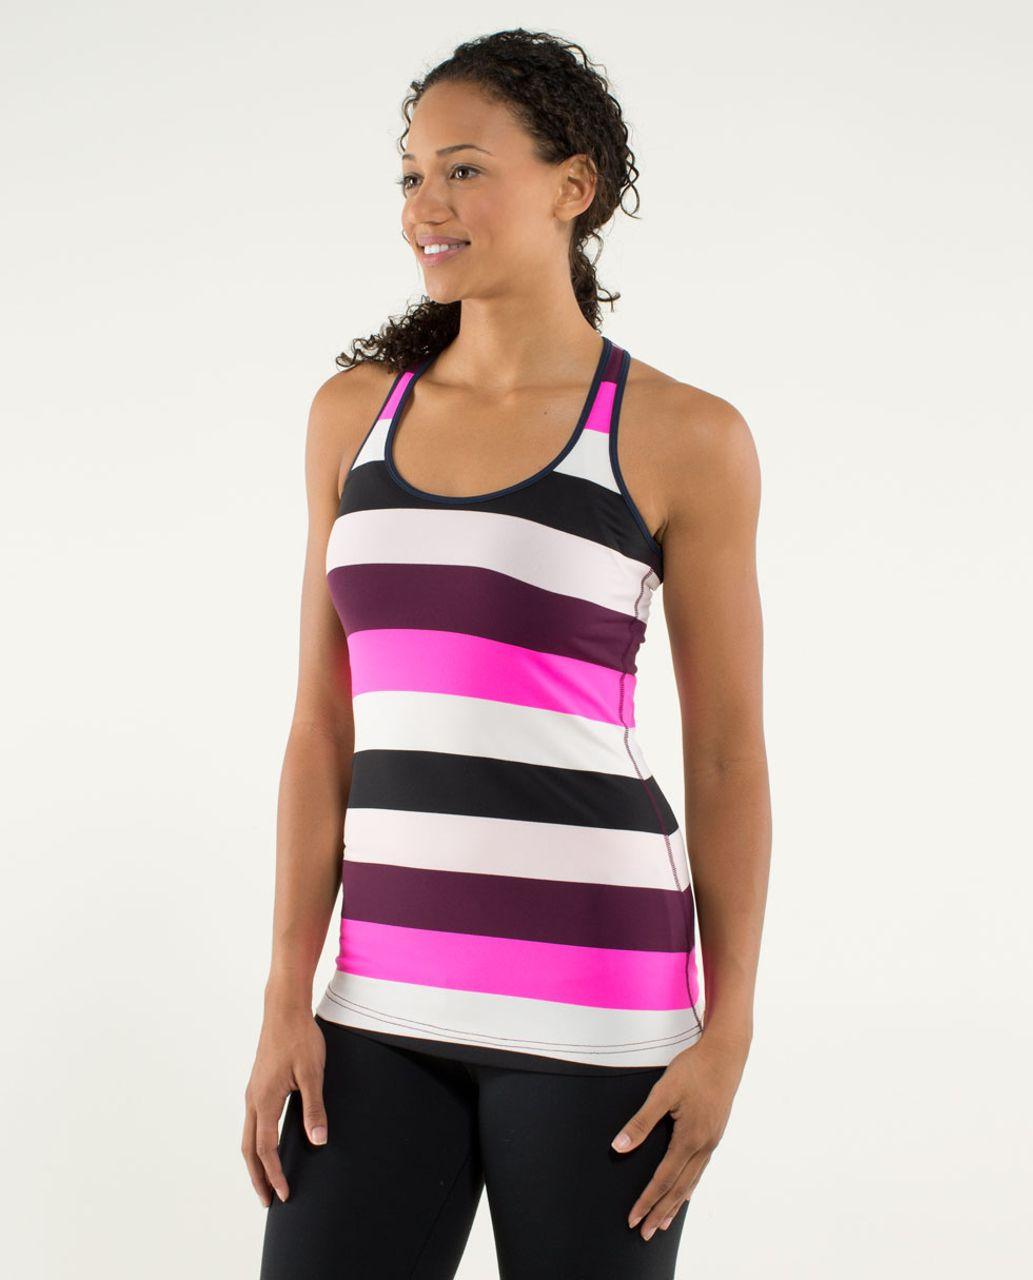 Lululemon Cool Racerback - Pow Stripe Raspberry Glo Light / Inkwell